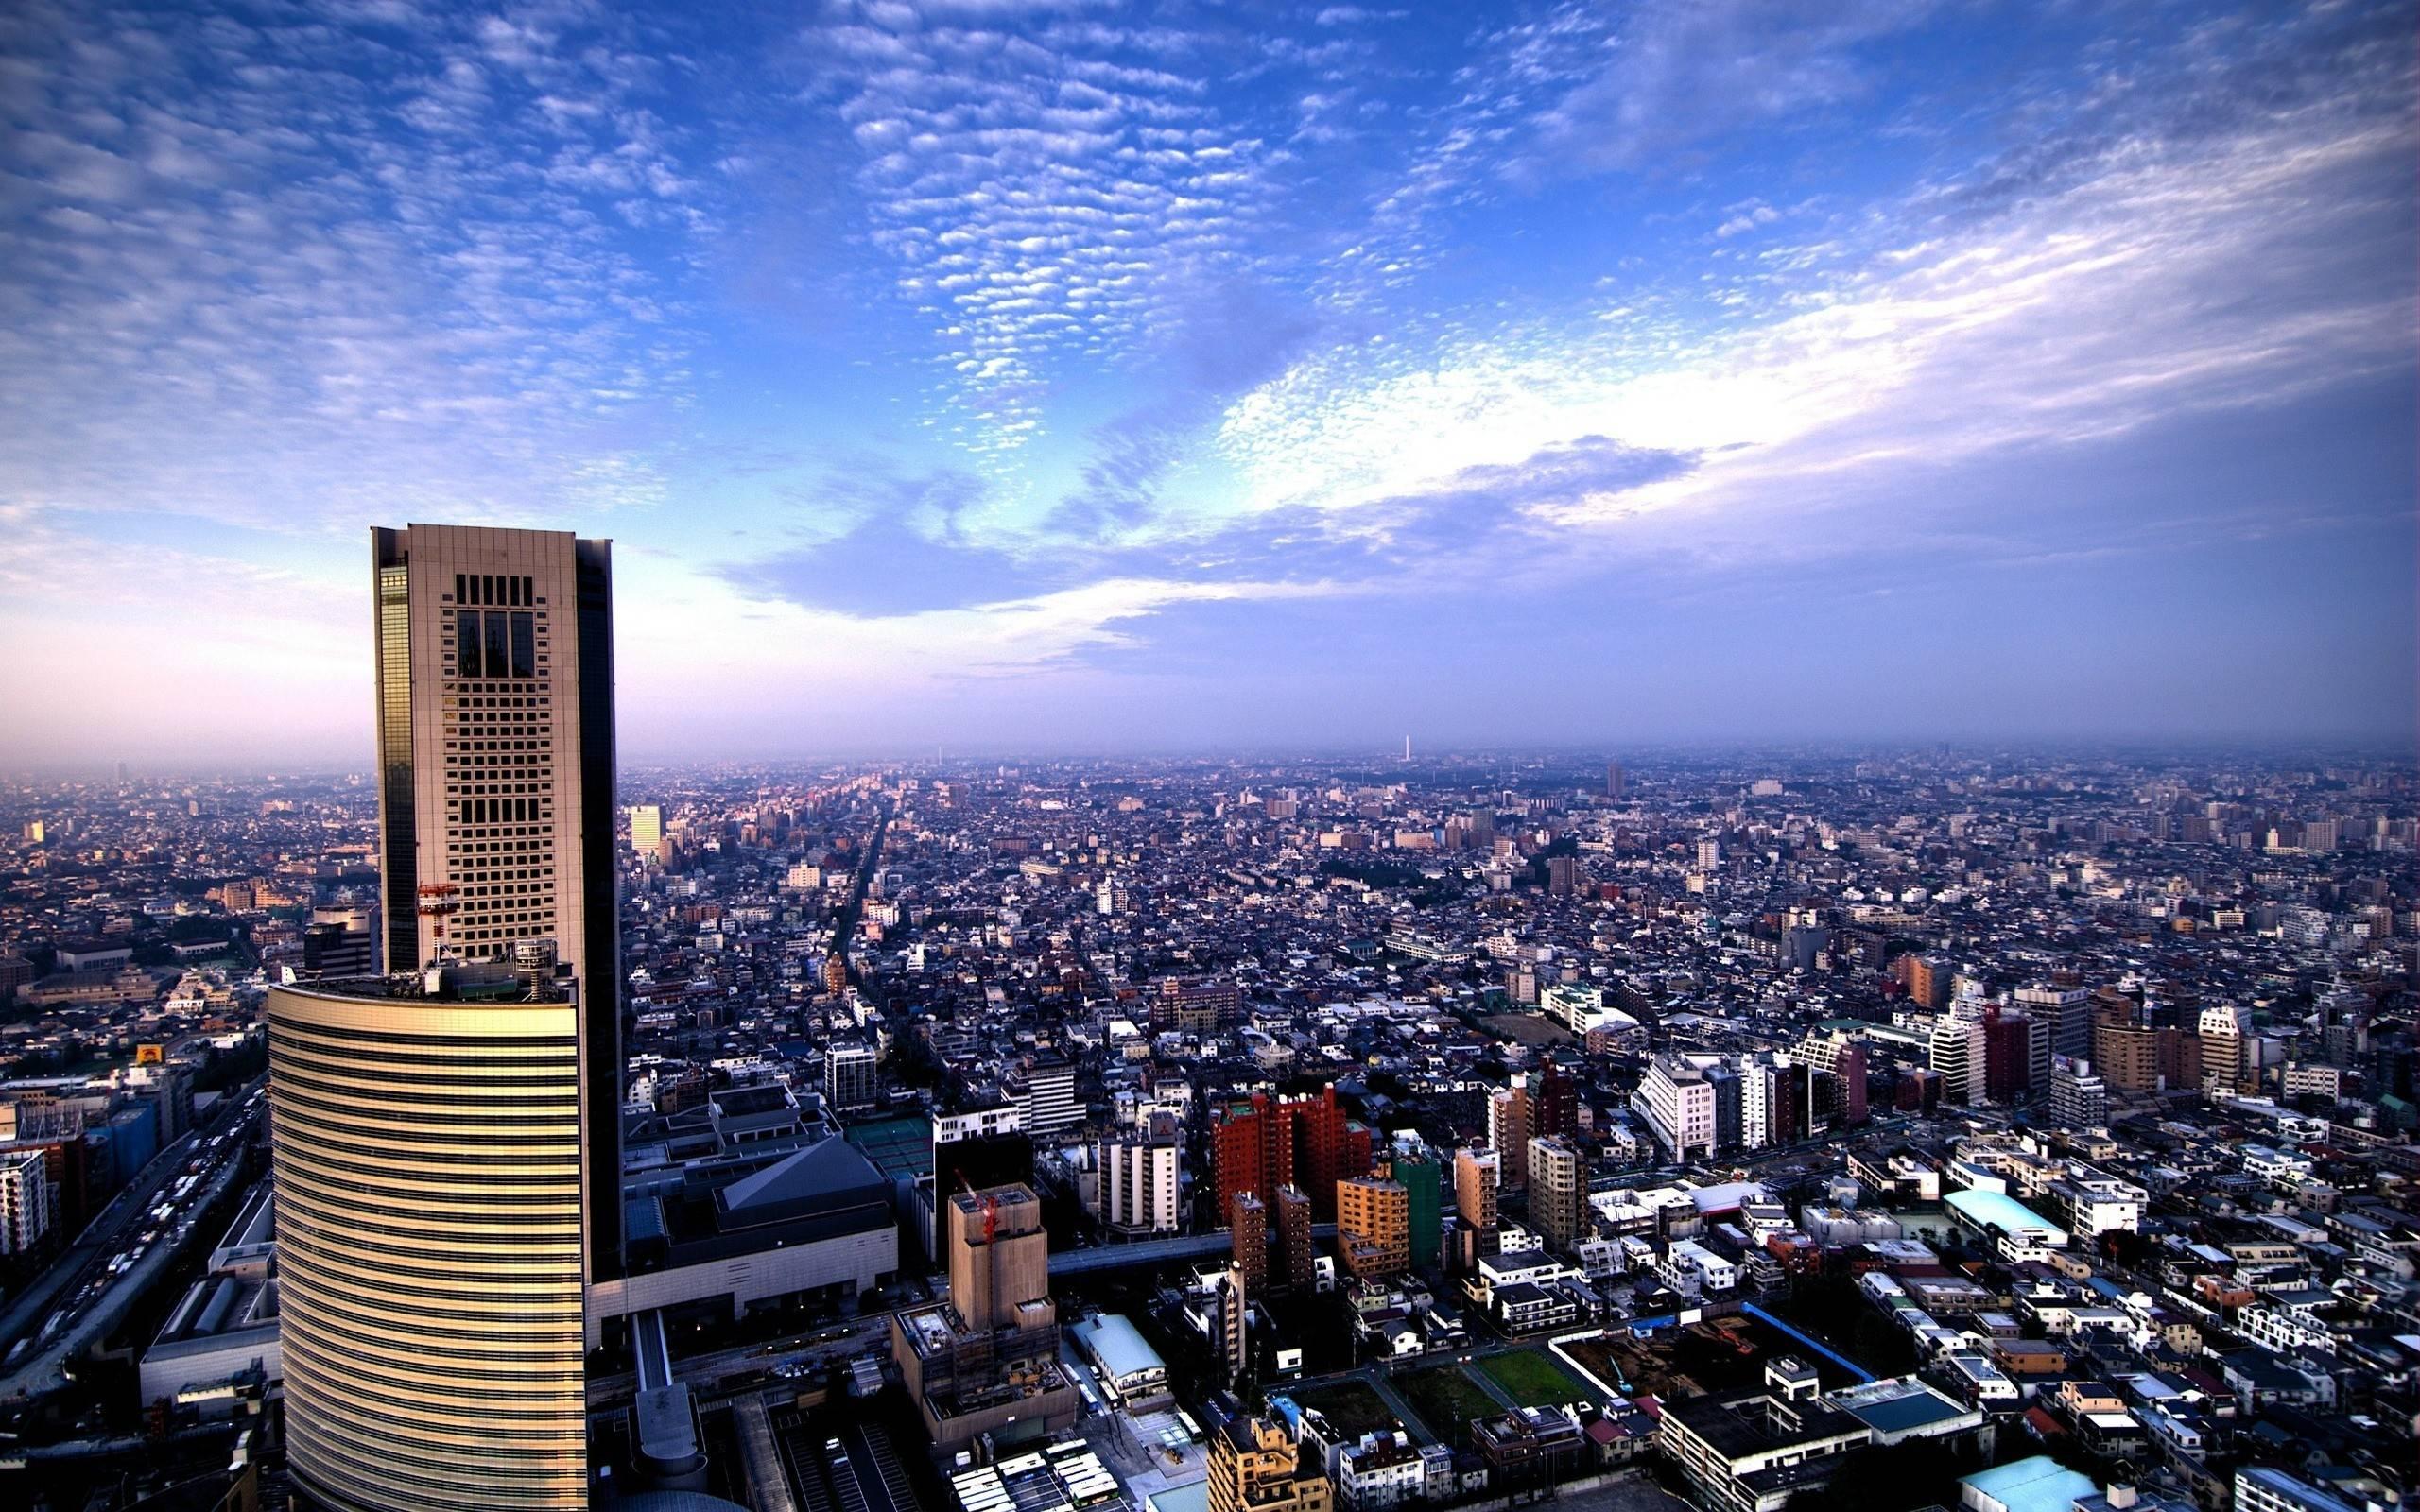 Fonds d'écran Tokyo : tous les wallpapers Tokyo